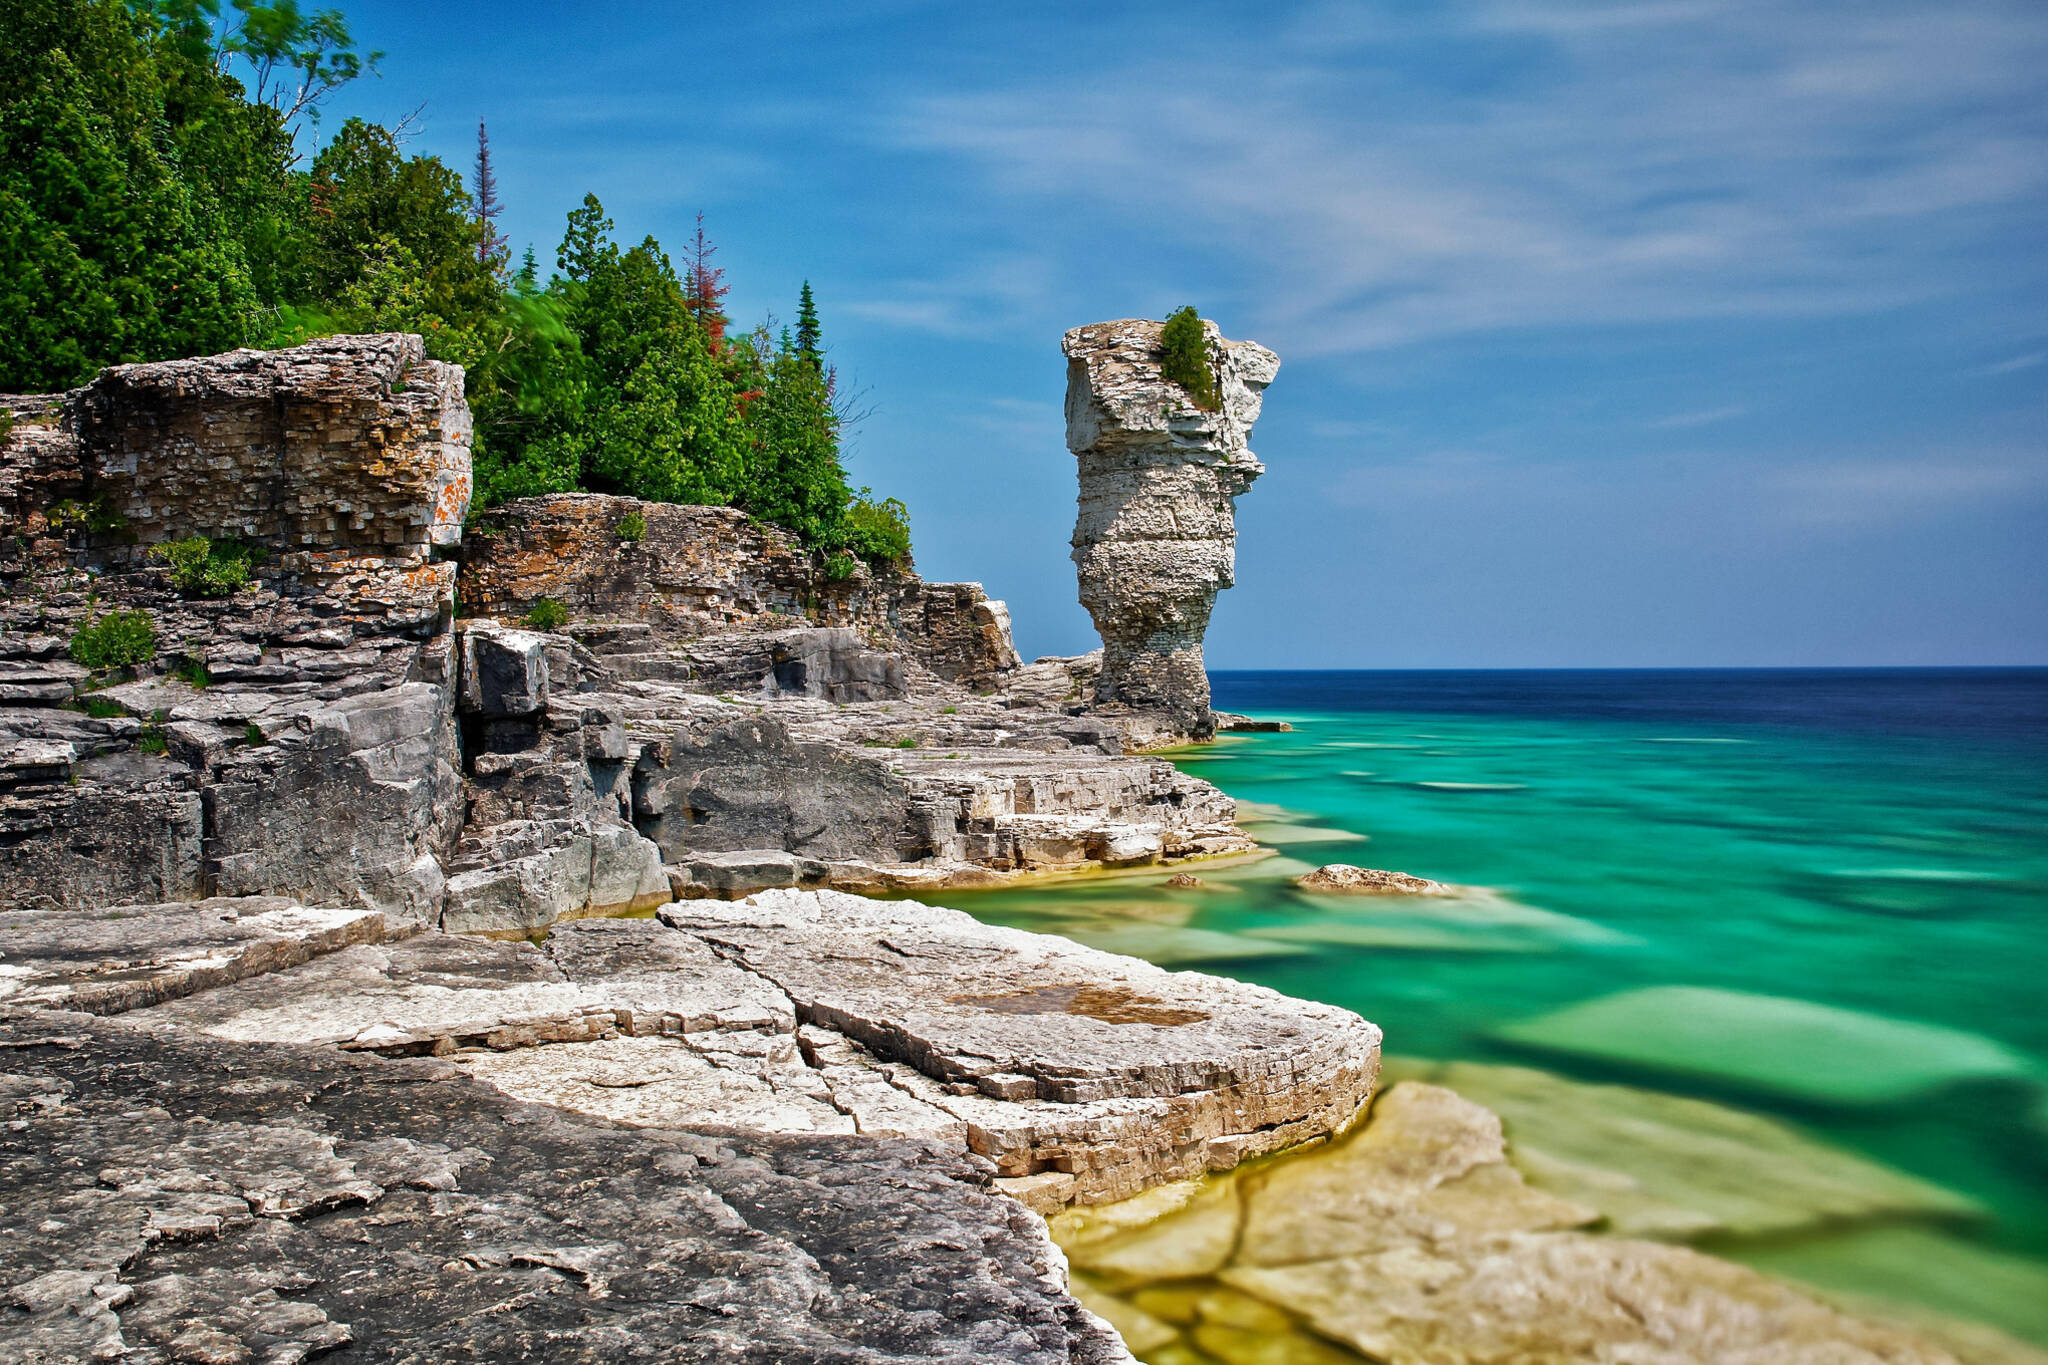 10 Secret Places To Explore In Ontario This Summer